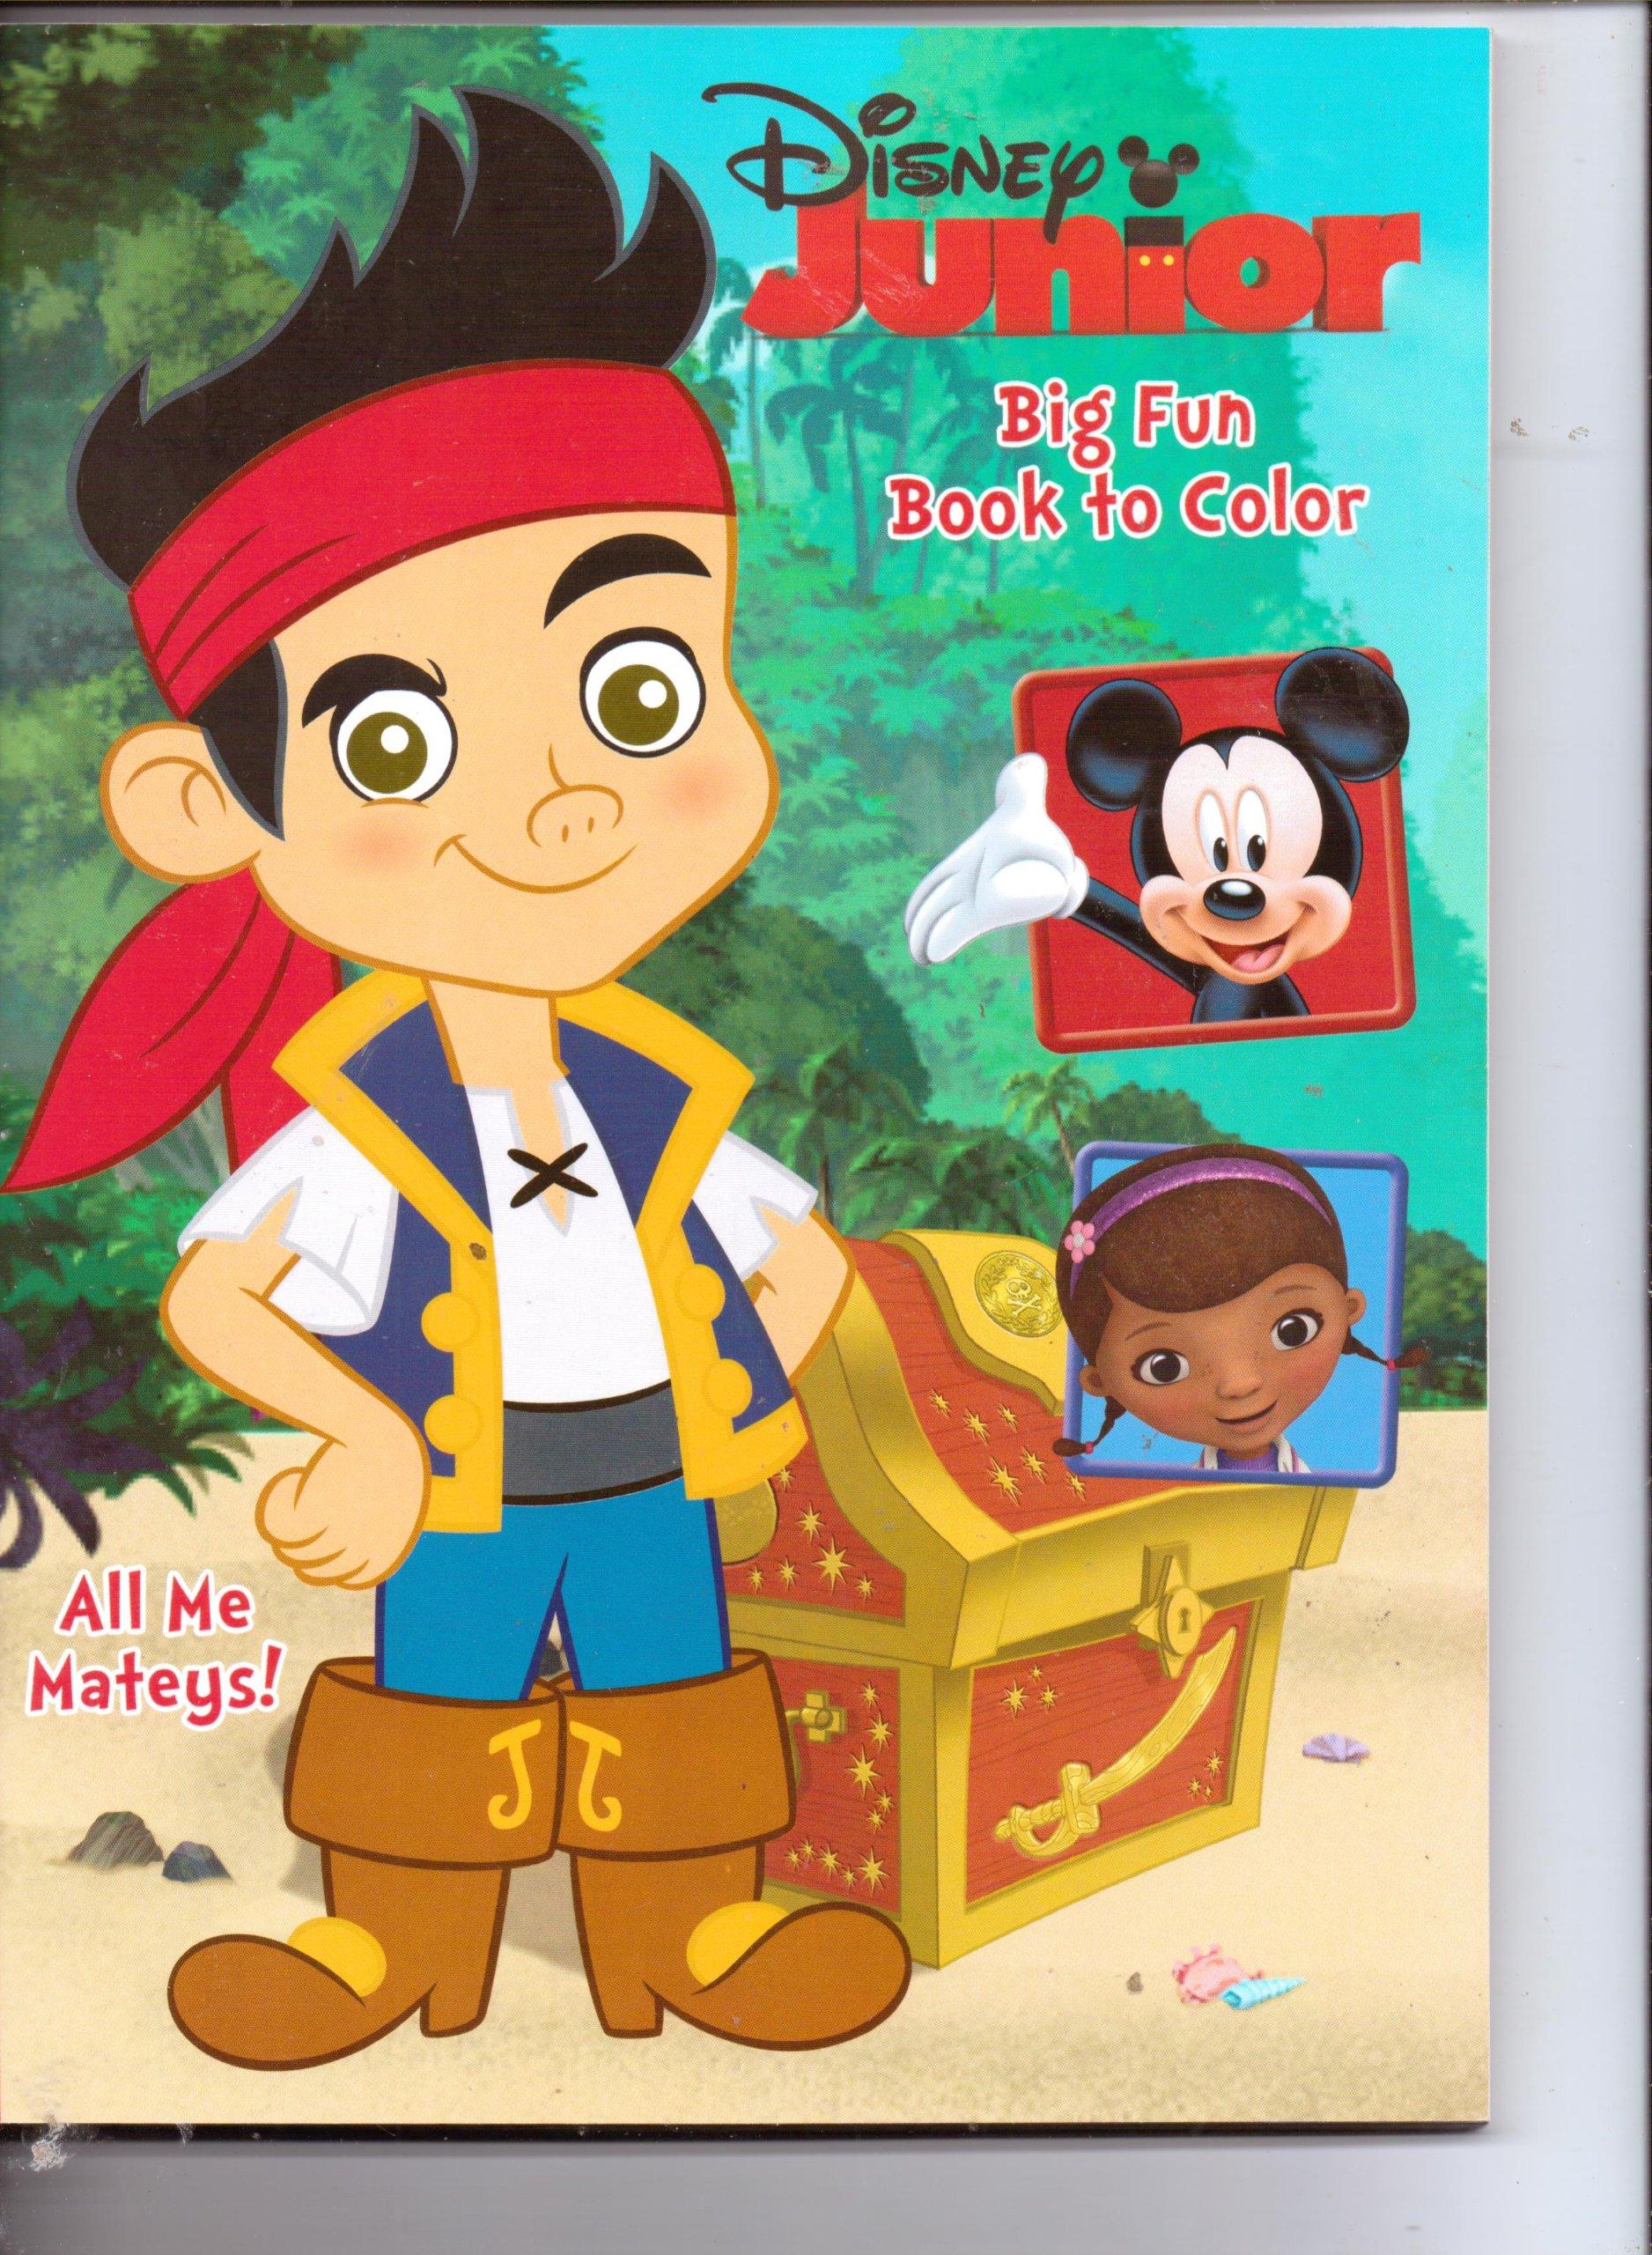 Download Disney Junior Big Fun Book to Color ~ All Me Mateys! (Jake & the Never Land Pirates) PDF